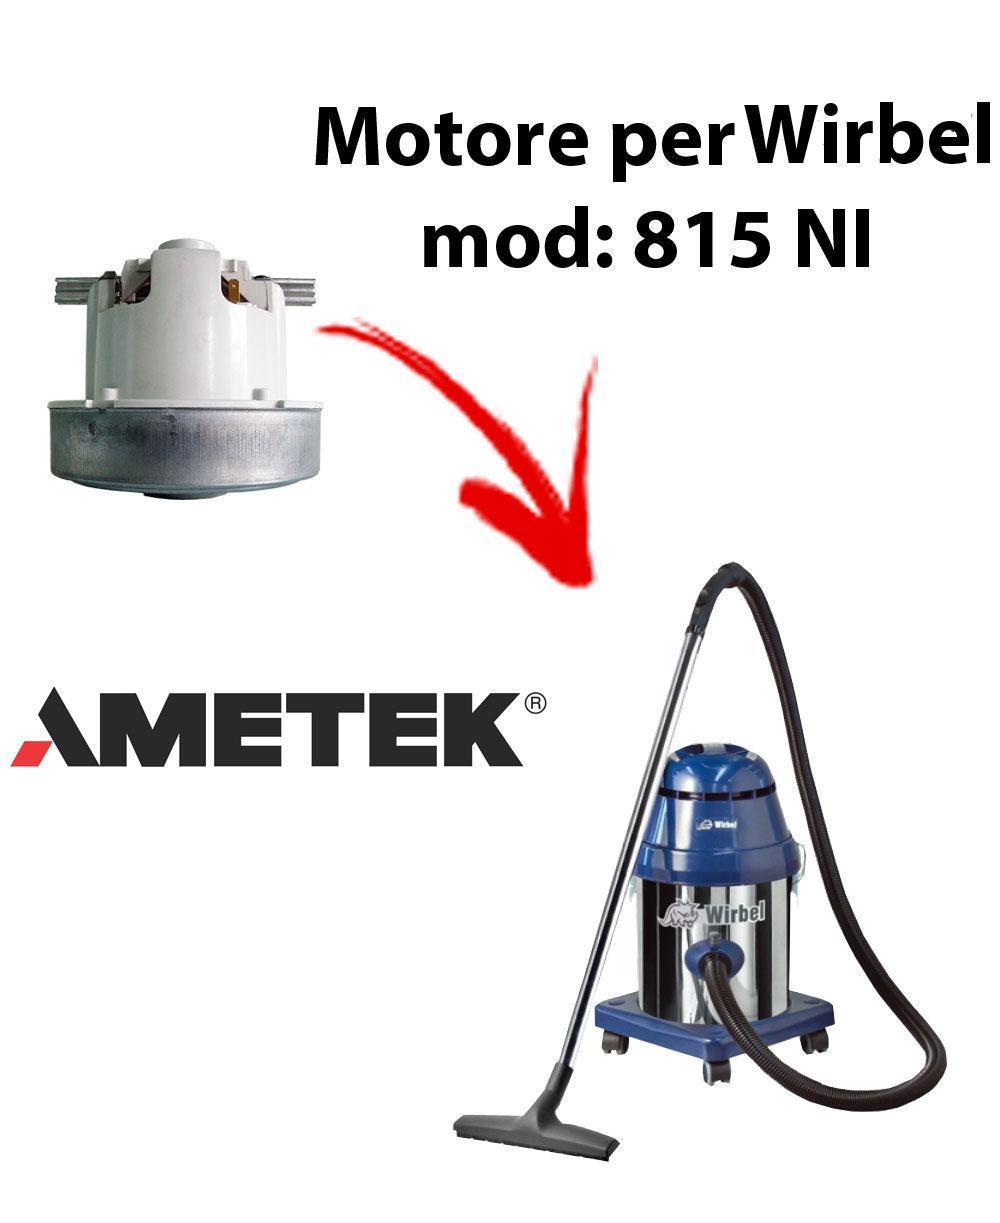 815 NI  Ametek Vacuum Motor for Vacuum cleaner WIRBEL